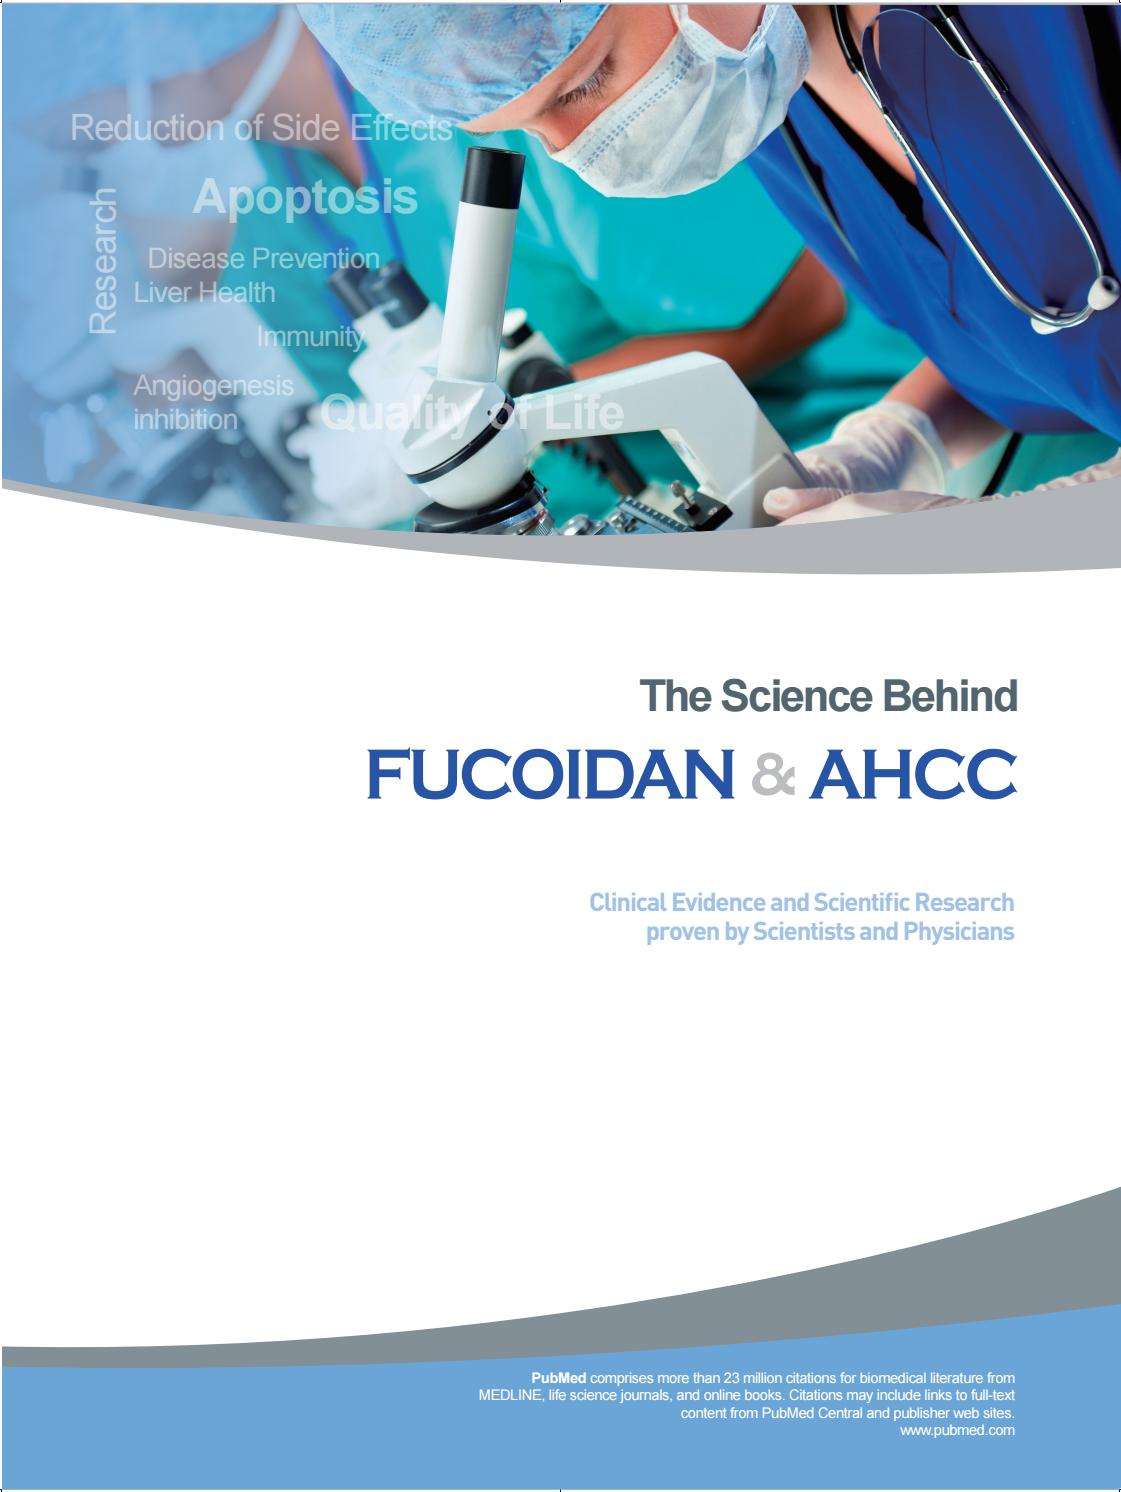 The Science Behind Fucoidan & AHCC by FucoidanAHCC - issuu